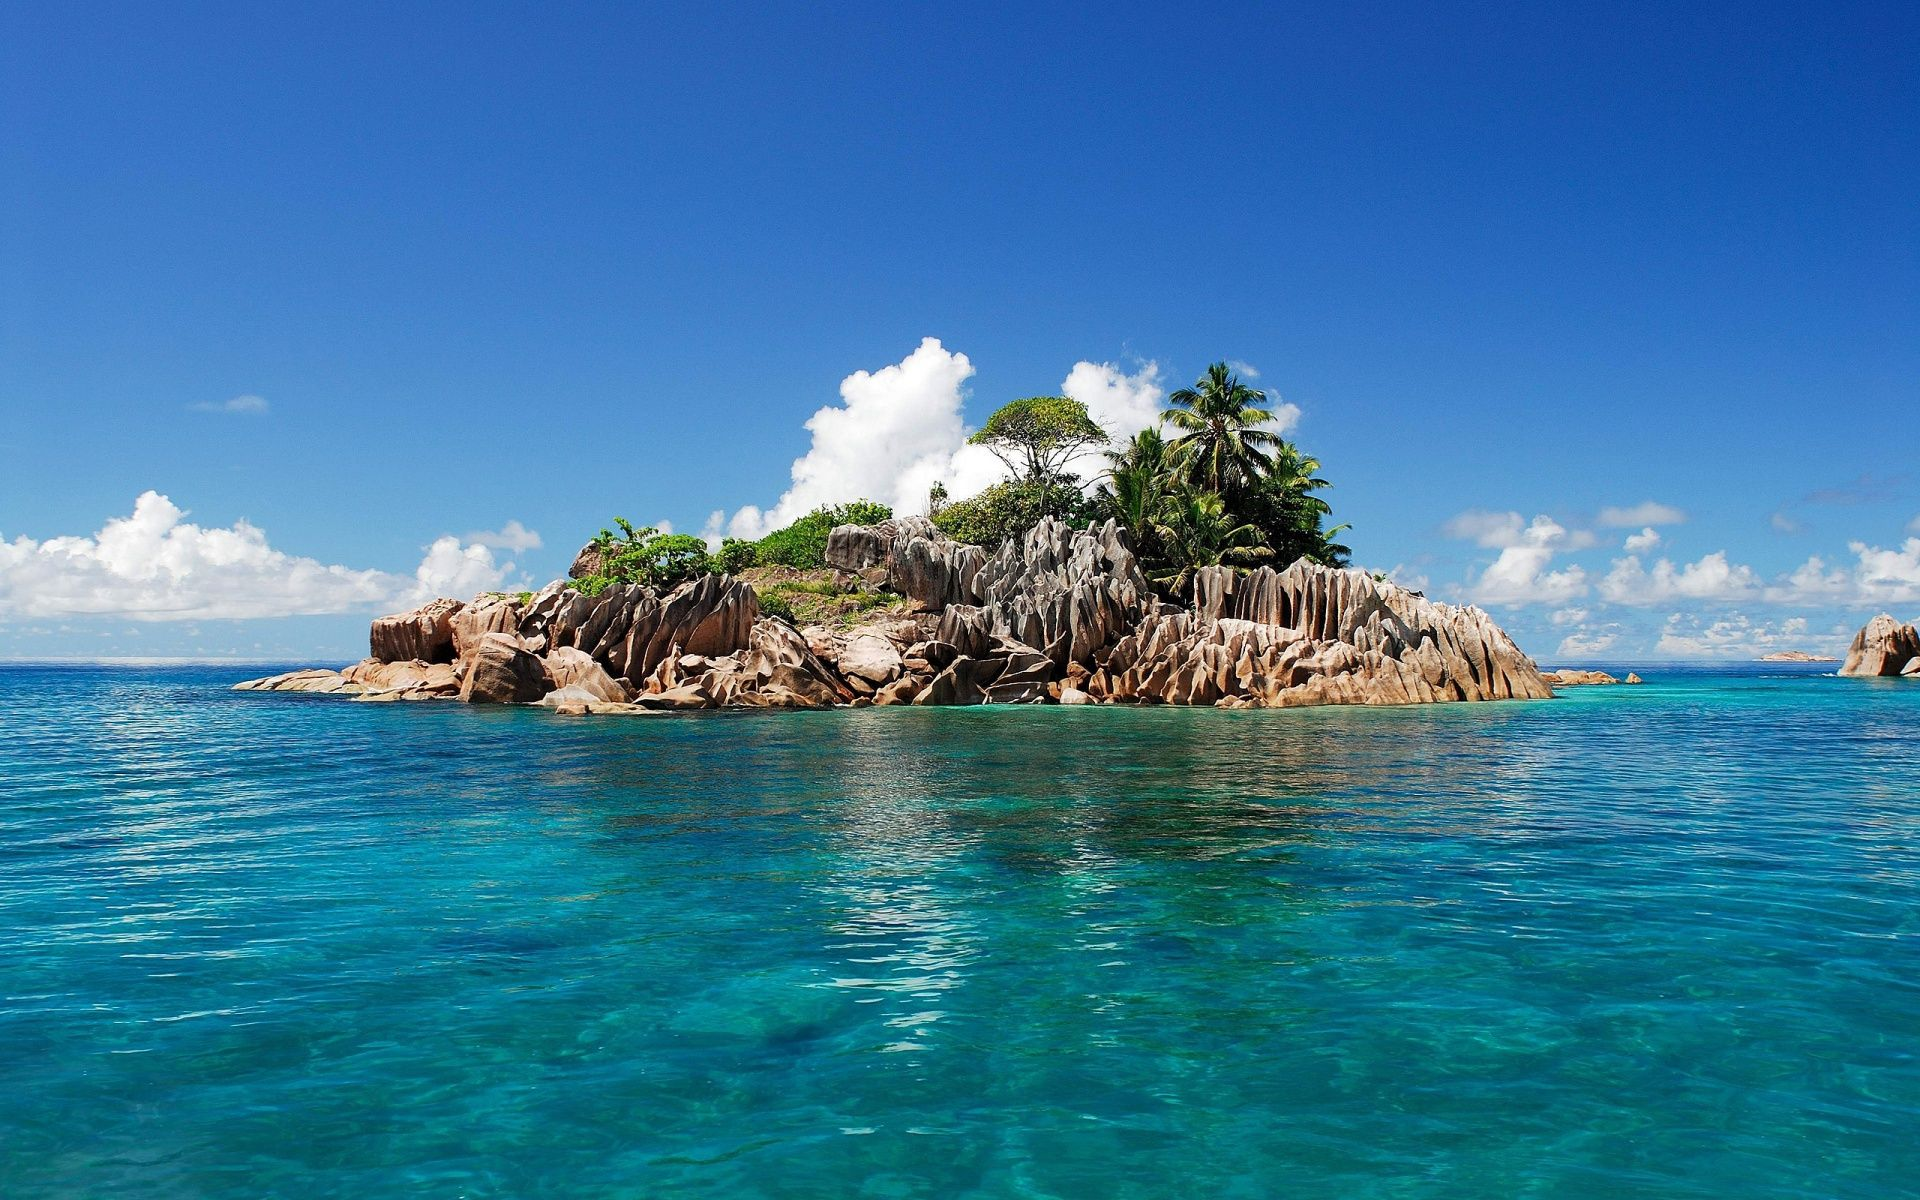 Tropical Island Wallpaper Island Wallpaper Tropical Islands Resort Tropical Islands